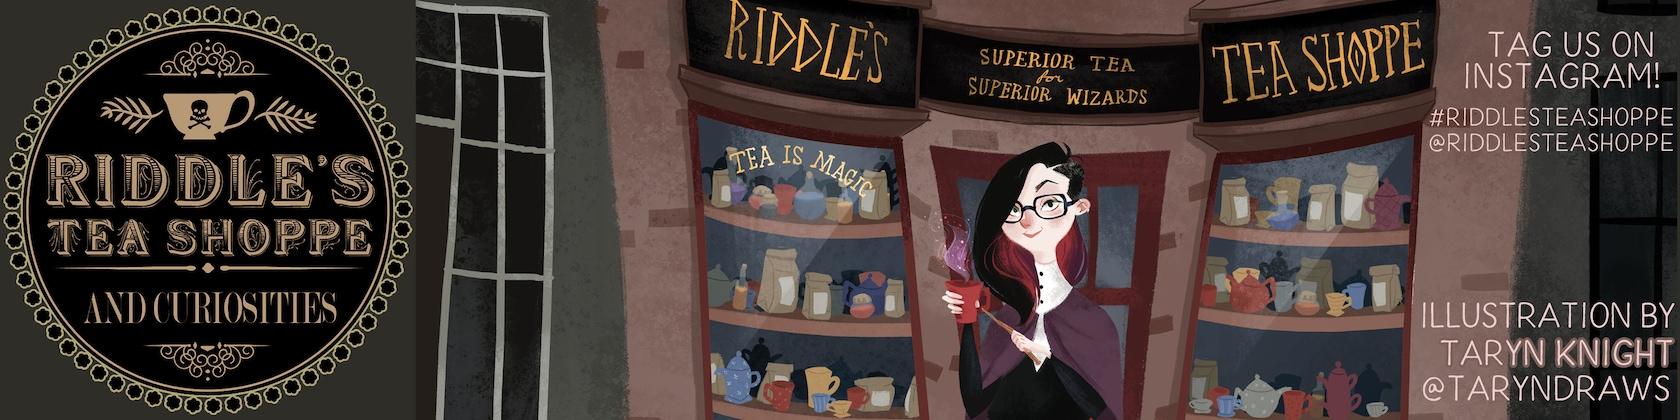 Riddle's Tea & Curiosities by RiddlesTeaShoppe on Etsy